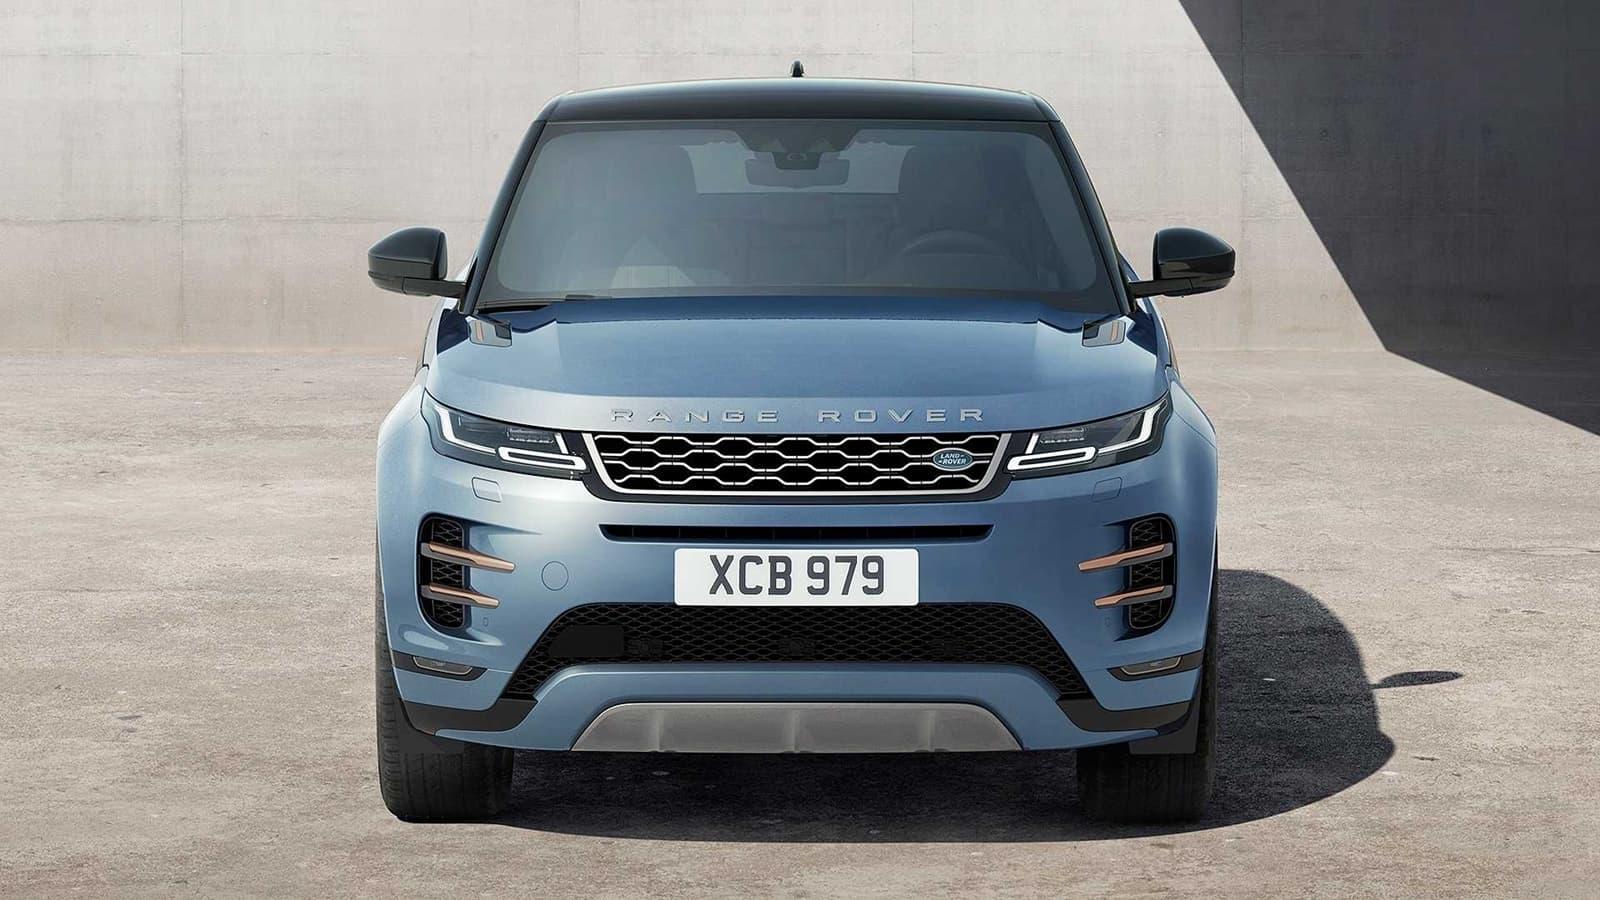 Range Rover Evoque 2019 1118 060